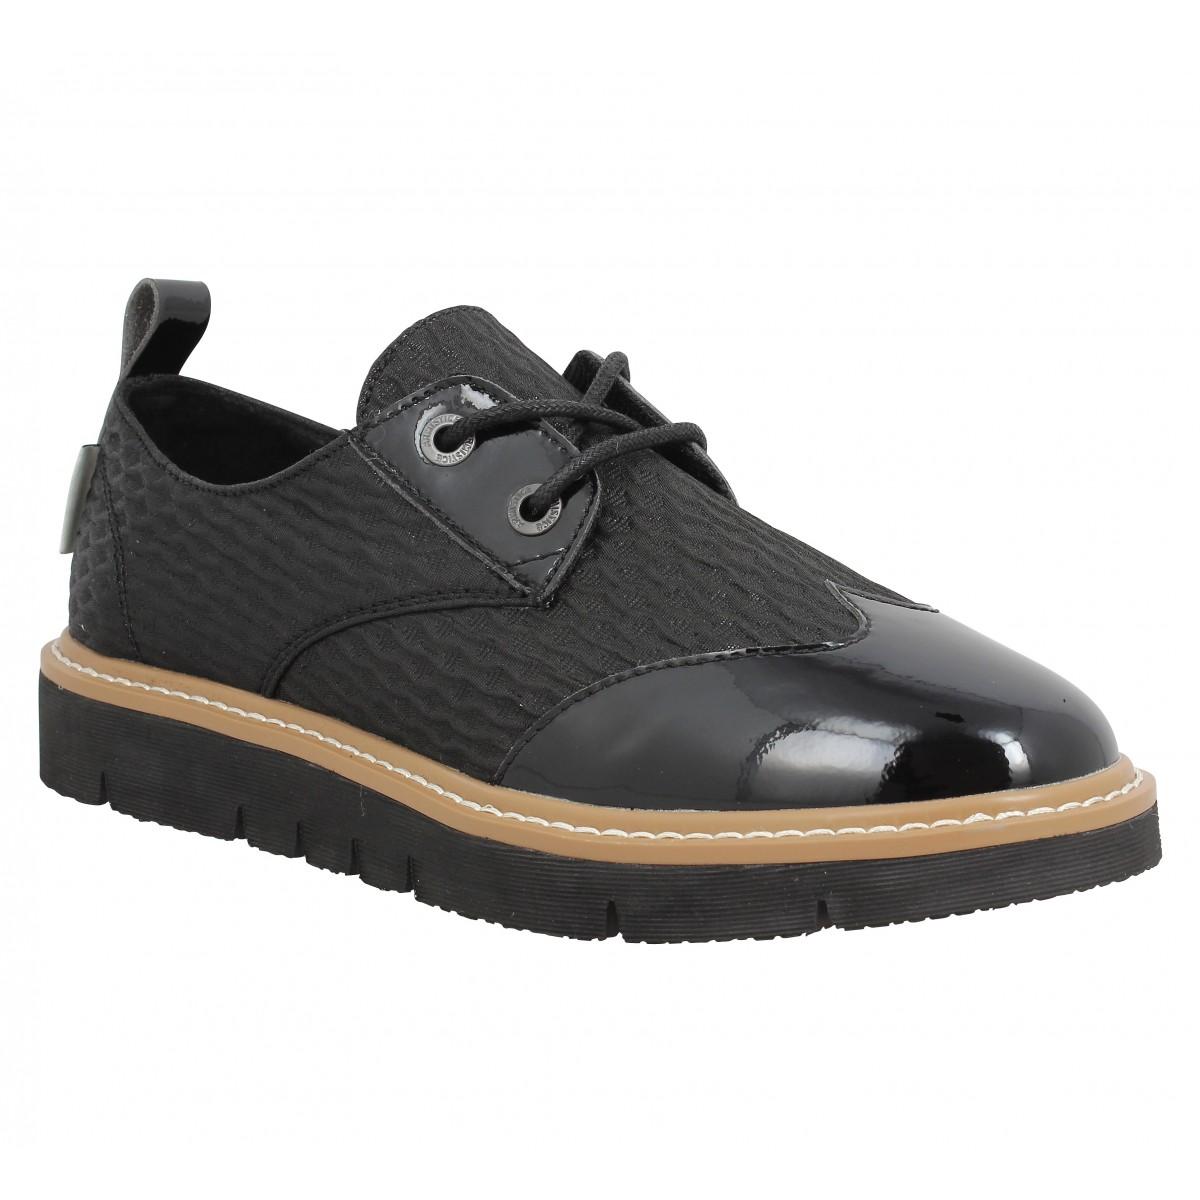 derbys chaussures pour femme vente en ligne. Black Bedroom Furniture Sets. Home Design Ideas